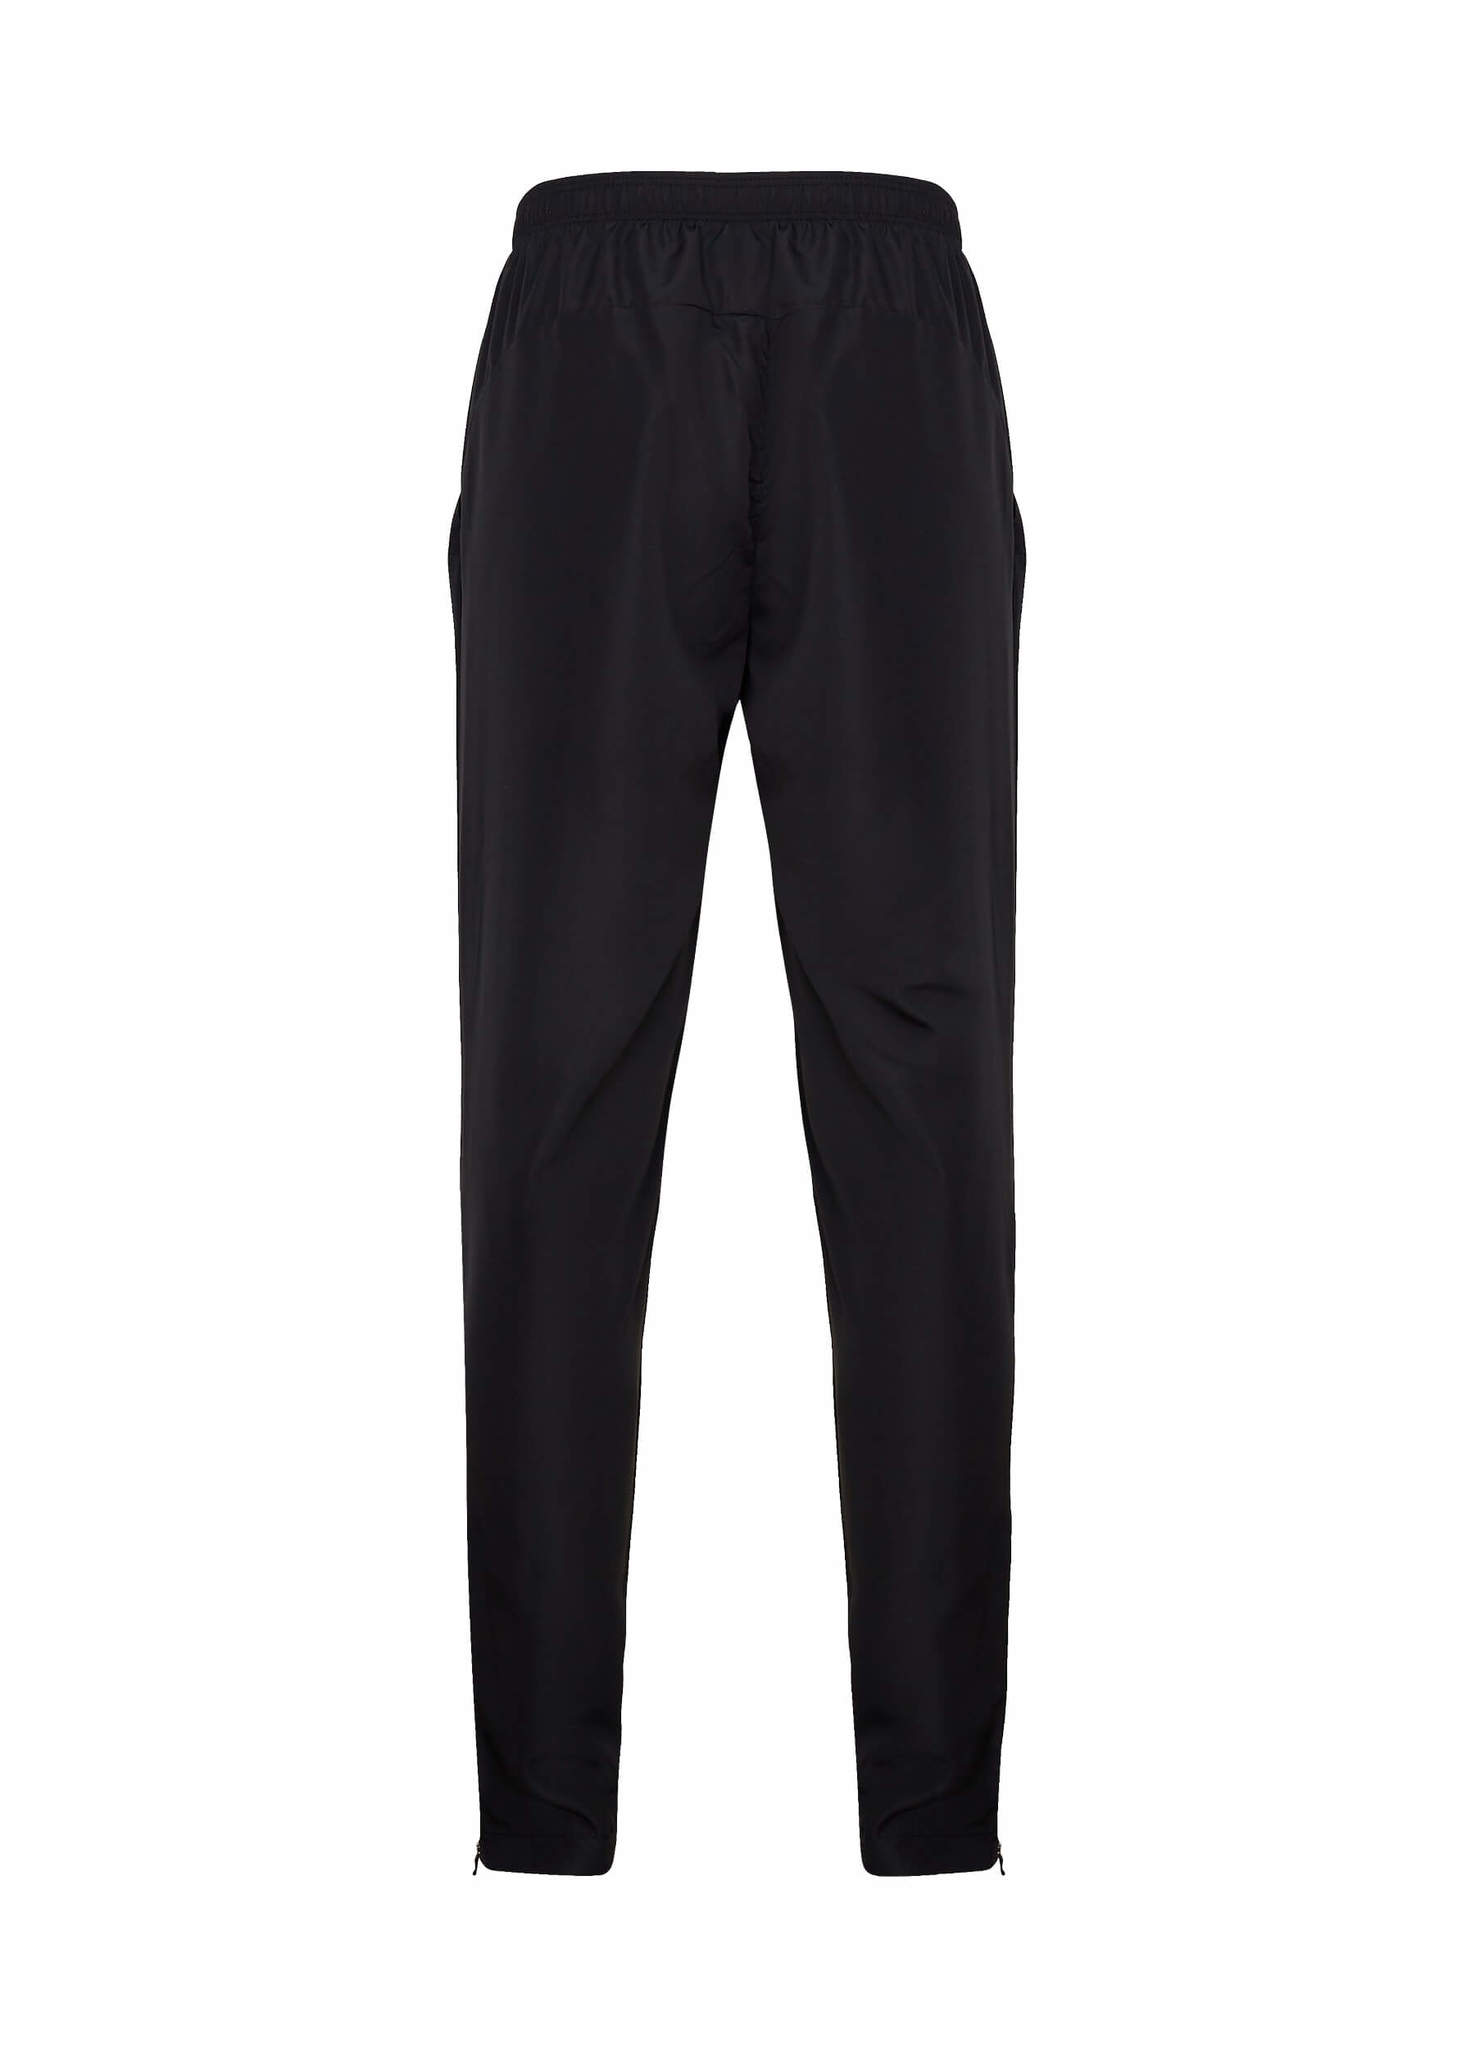 Nordski Motion брюки женские Black - 9